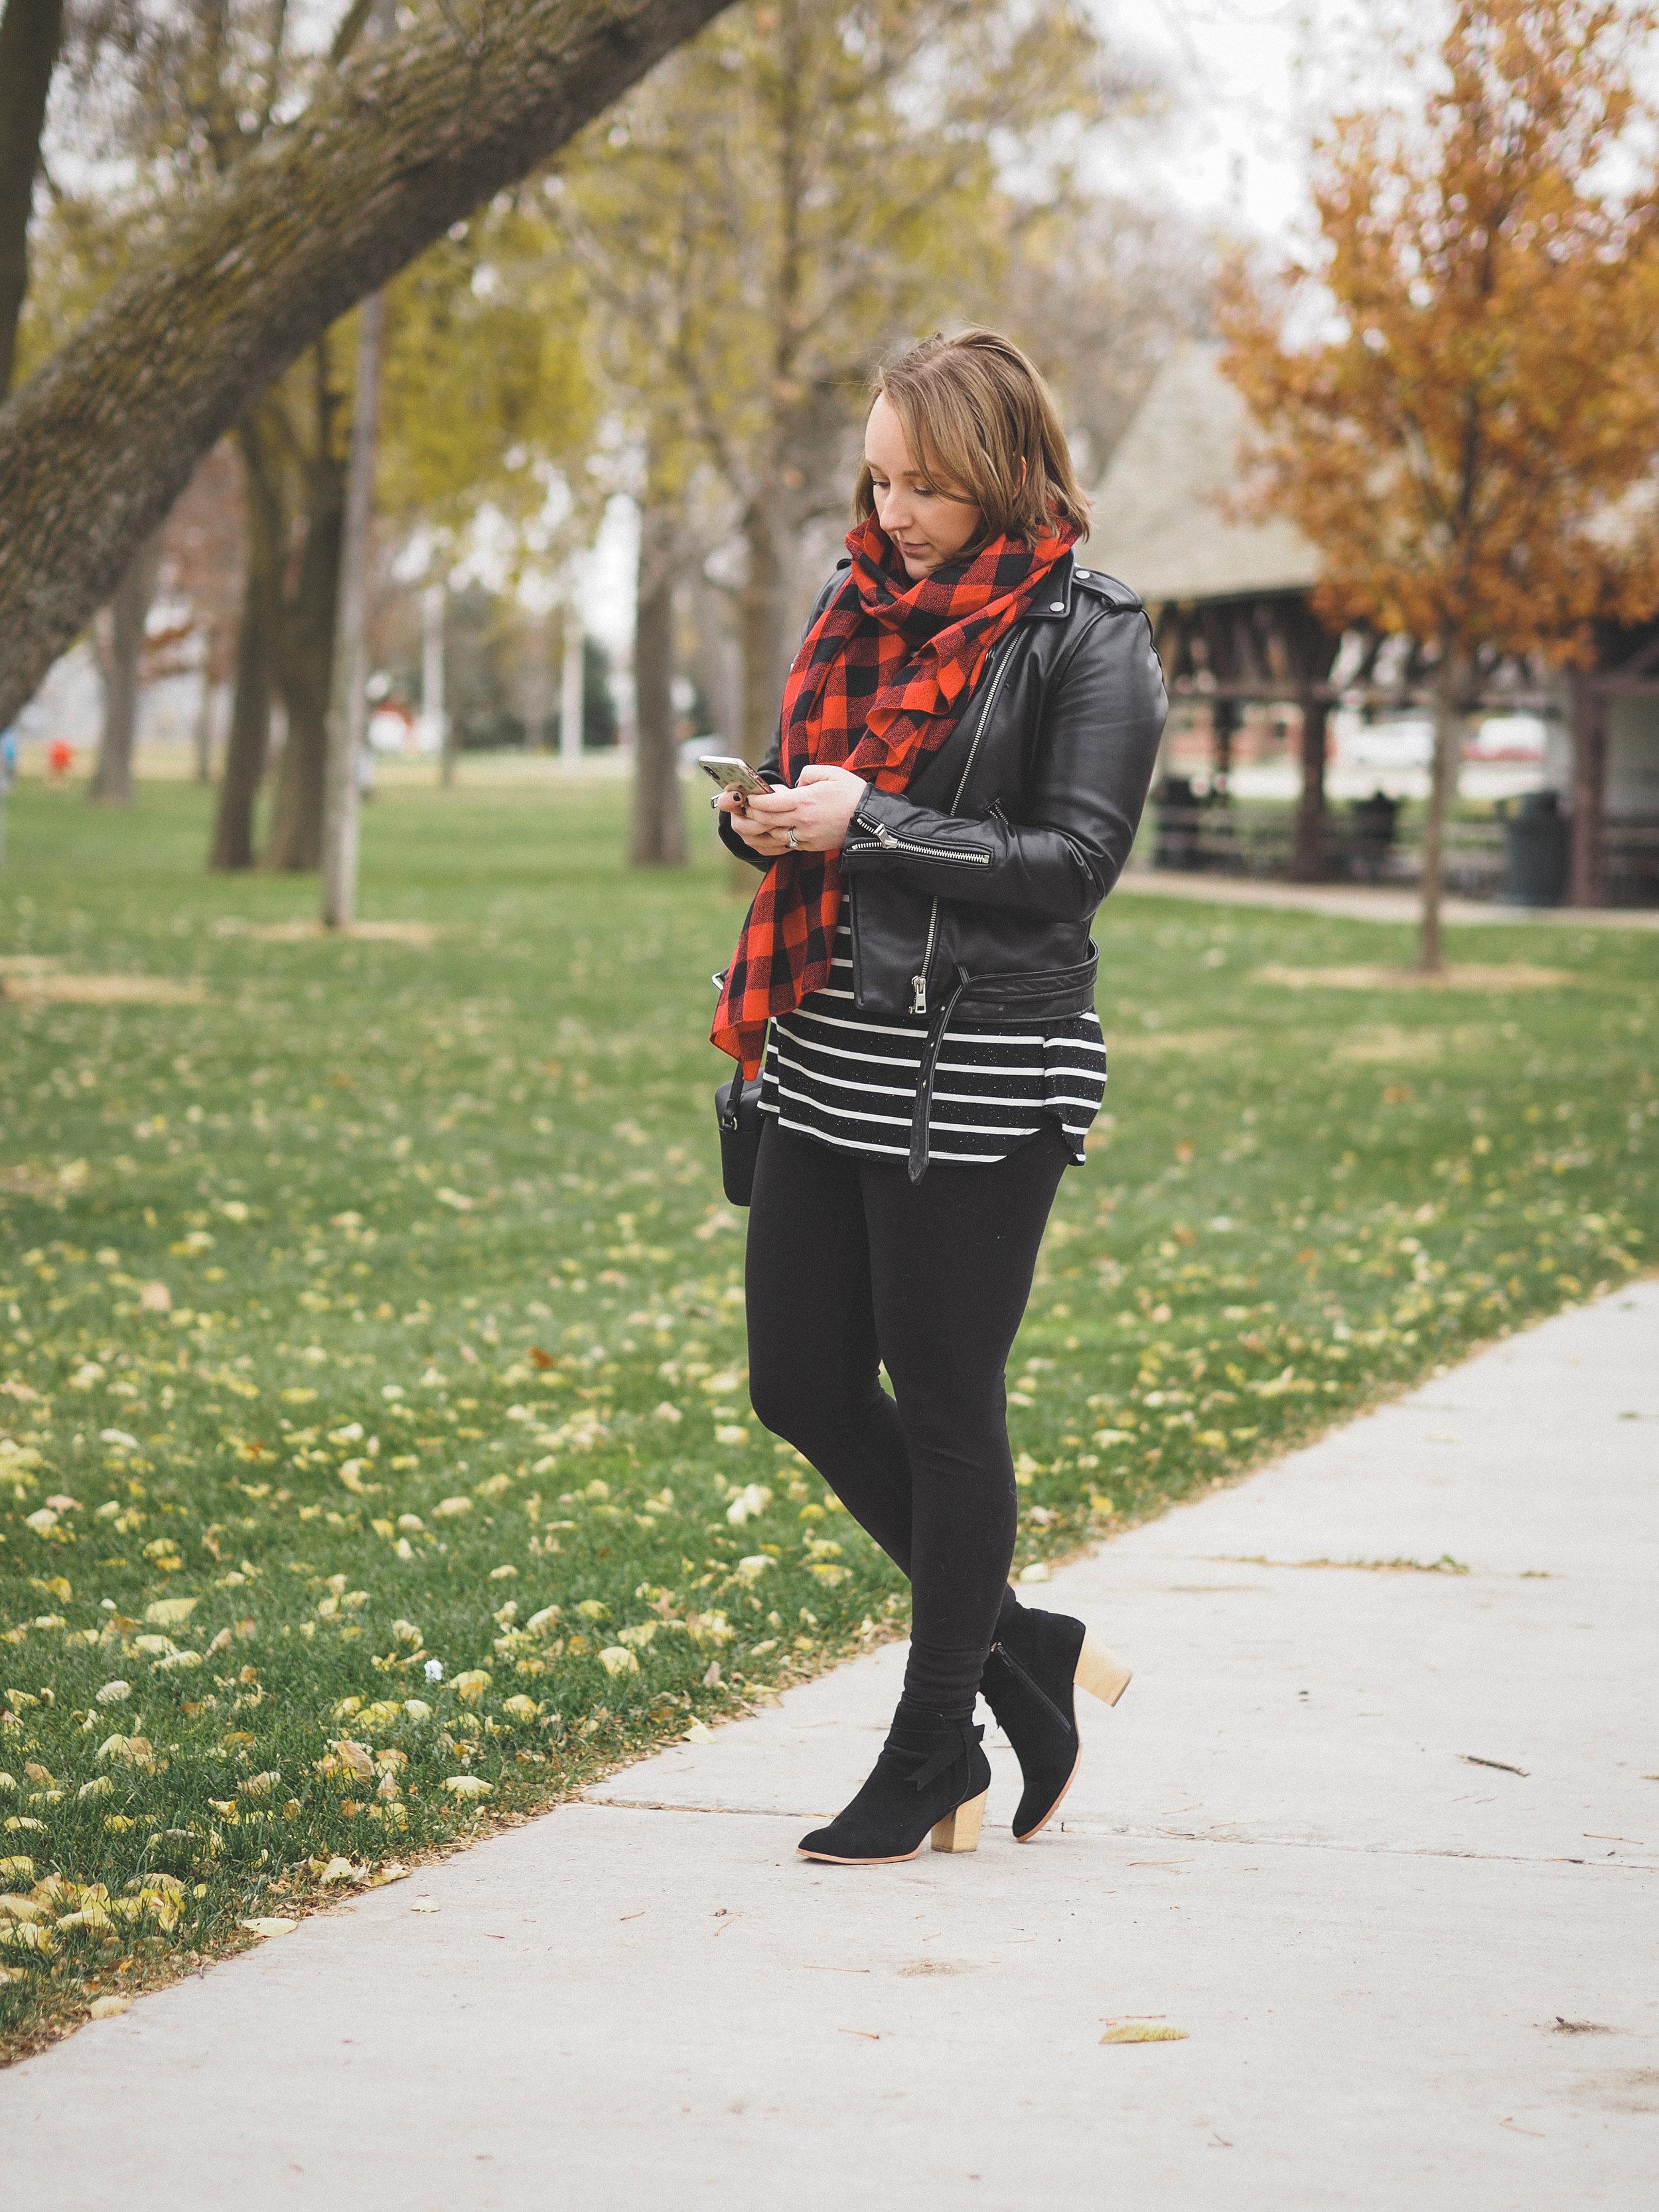 buffalo-plaid-scarf-leather-jacket-4.jpg